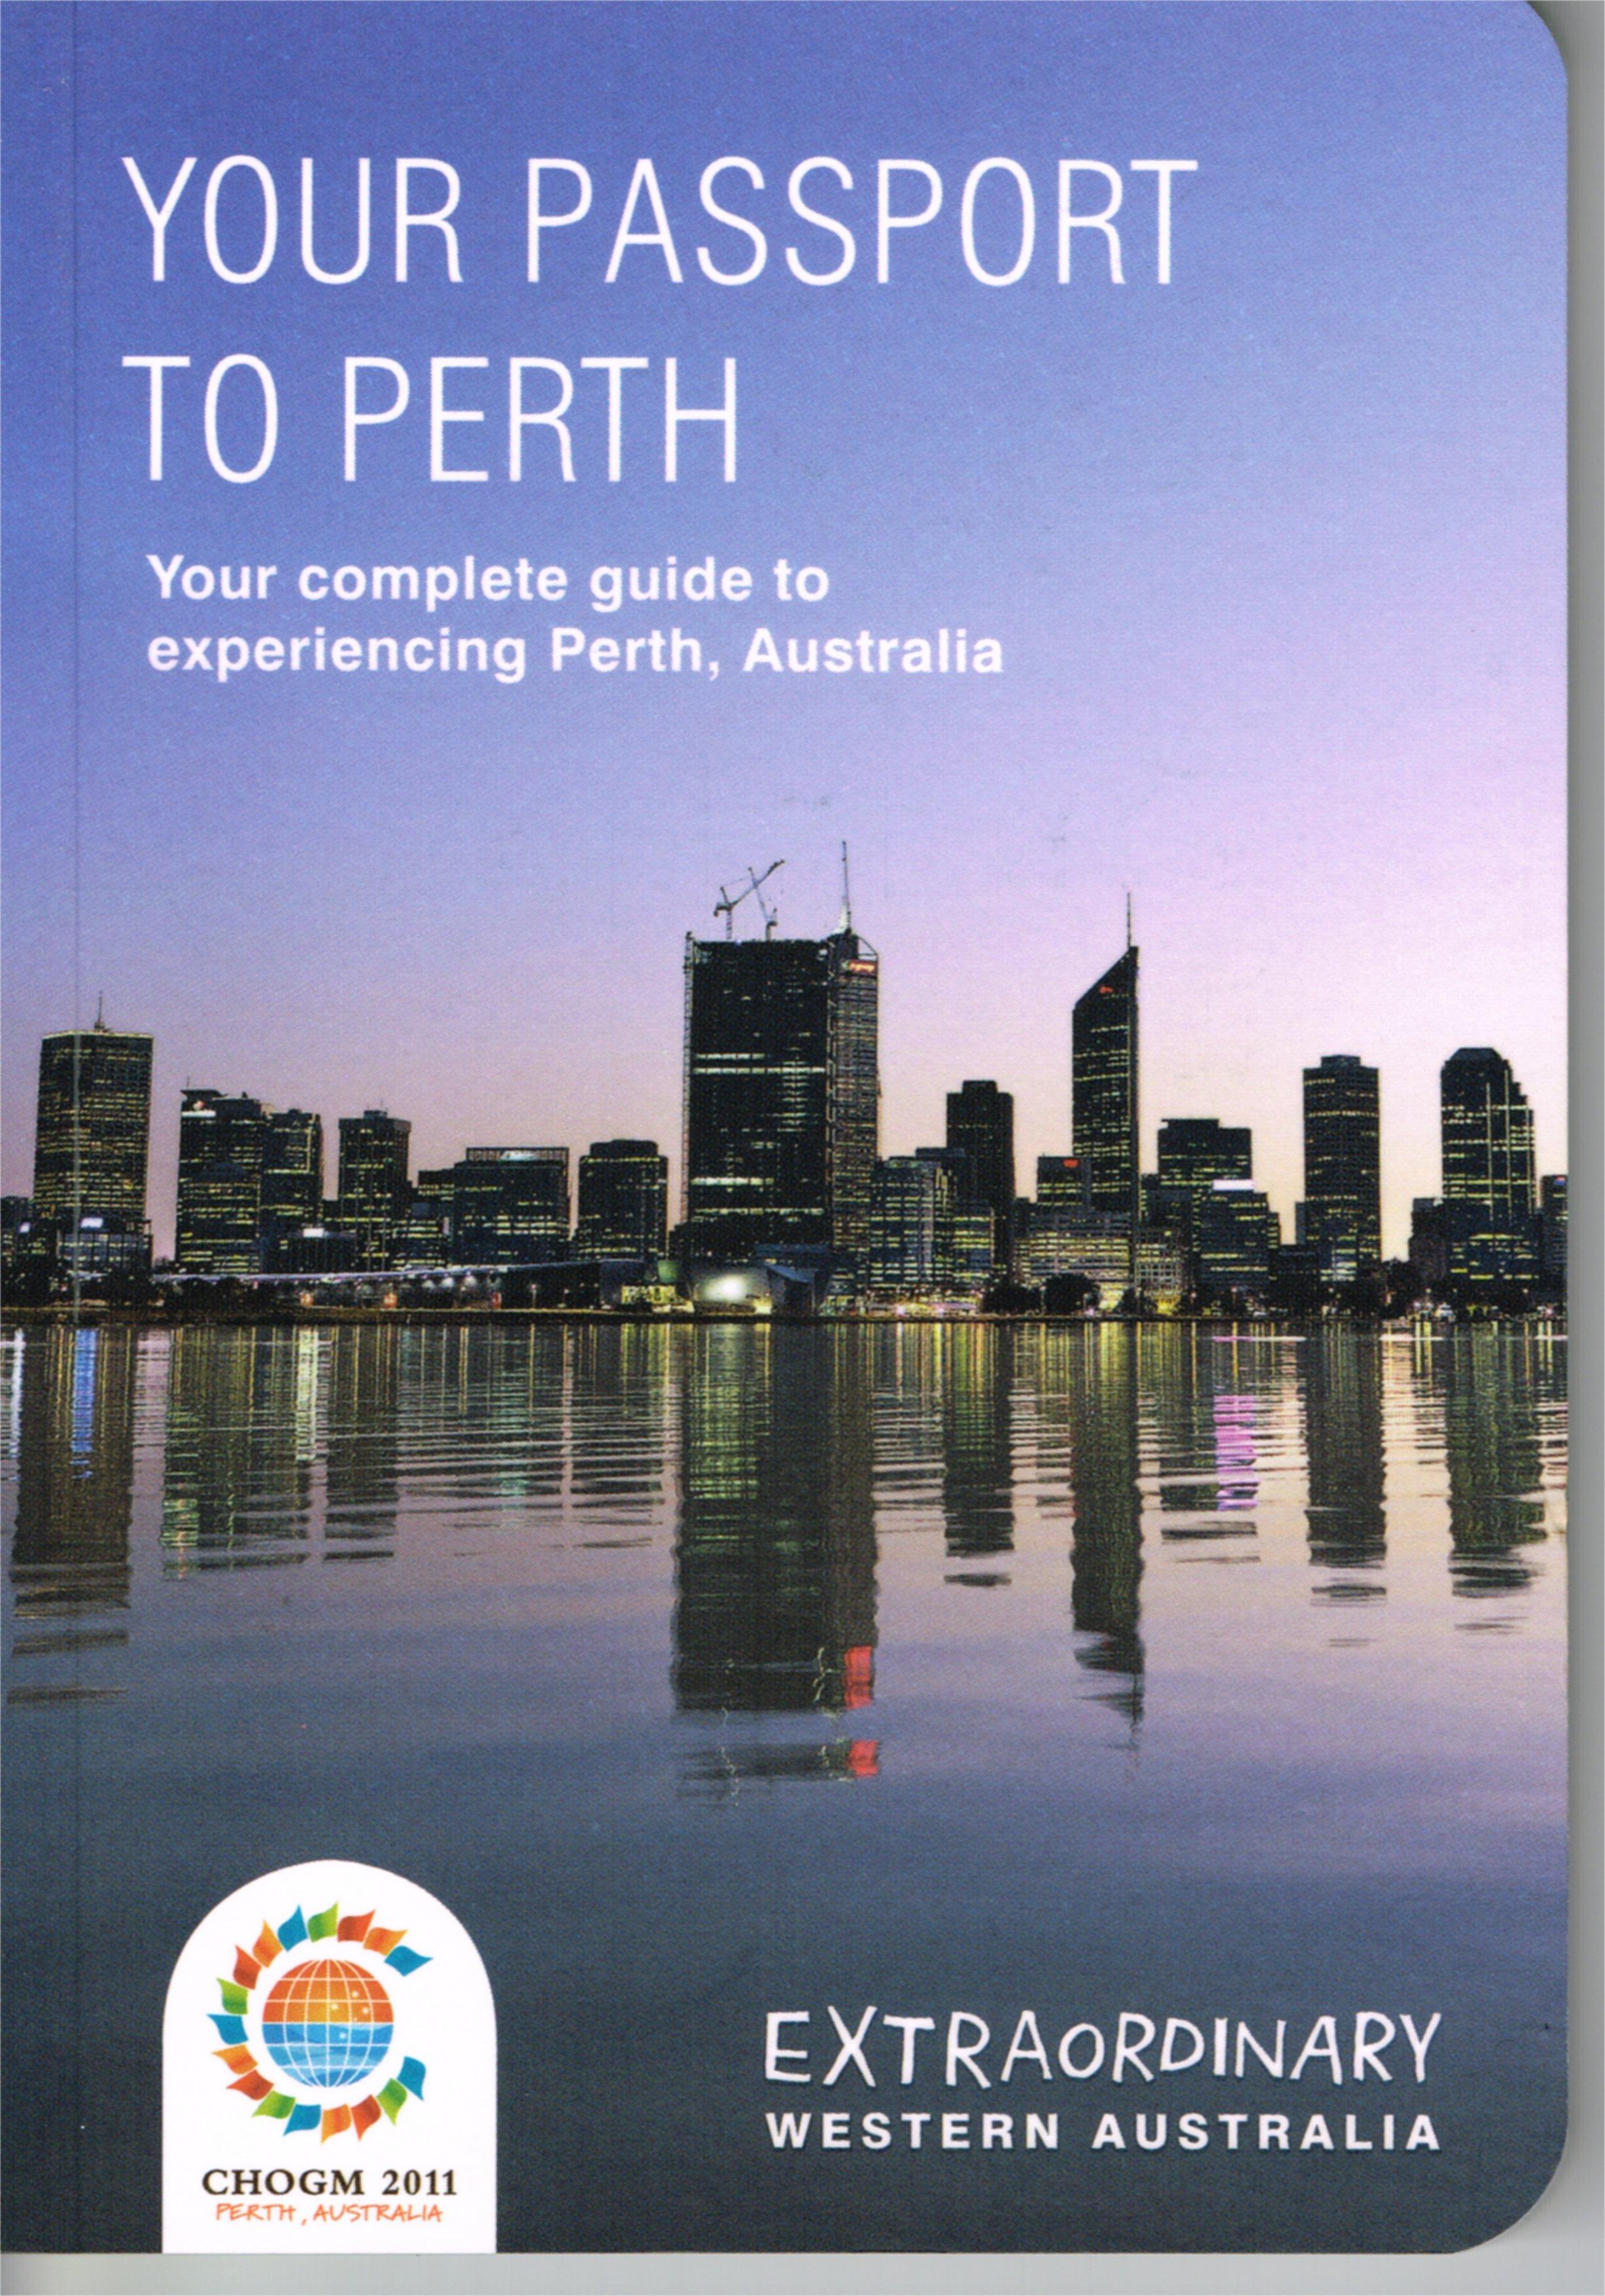 Your Passport to Perth (2011).jpg